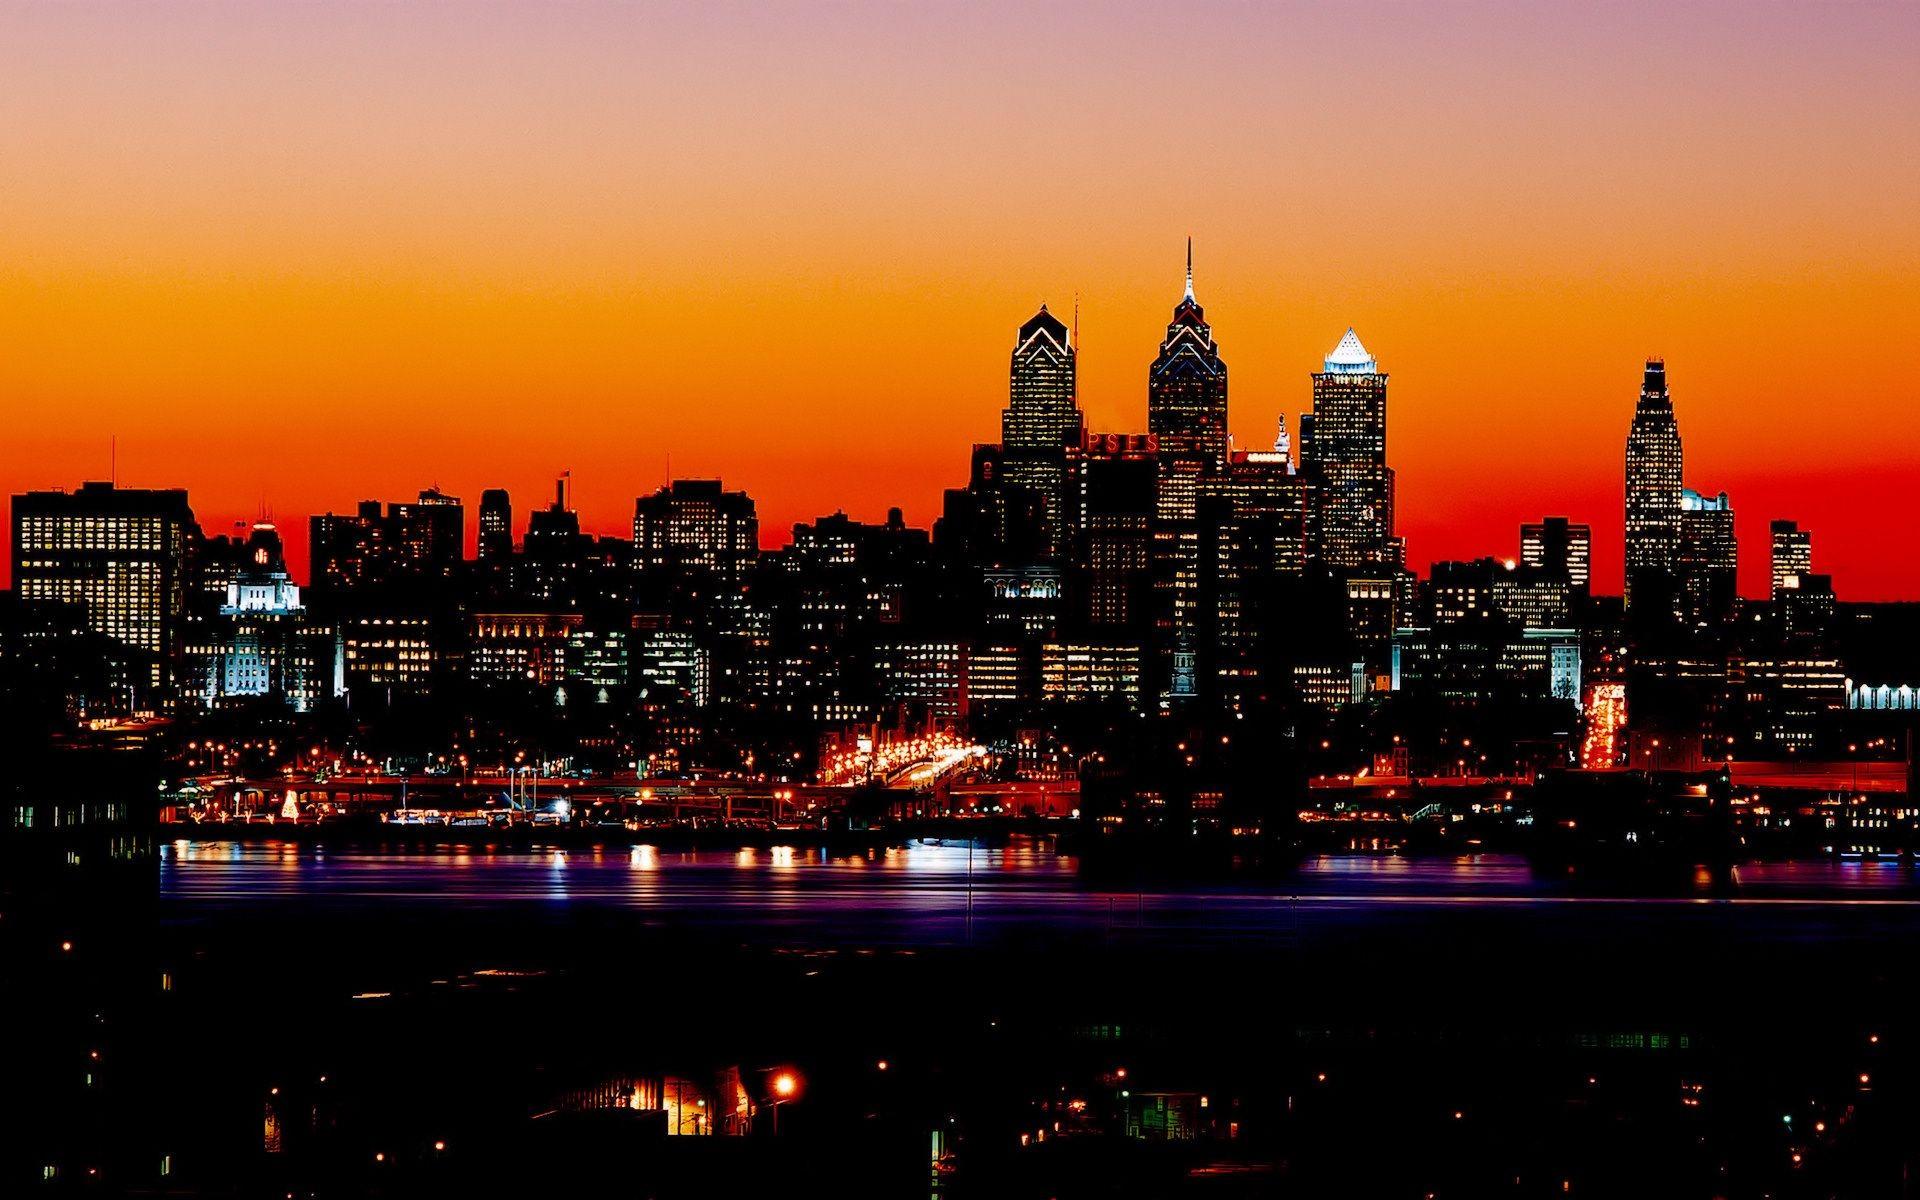 Philadelphia hd wallpapers wallpapersafari - Night light hd wallpaper ...